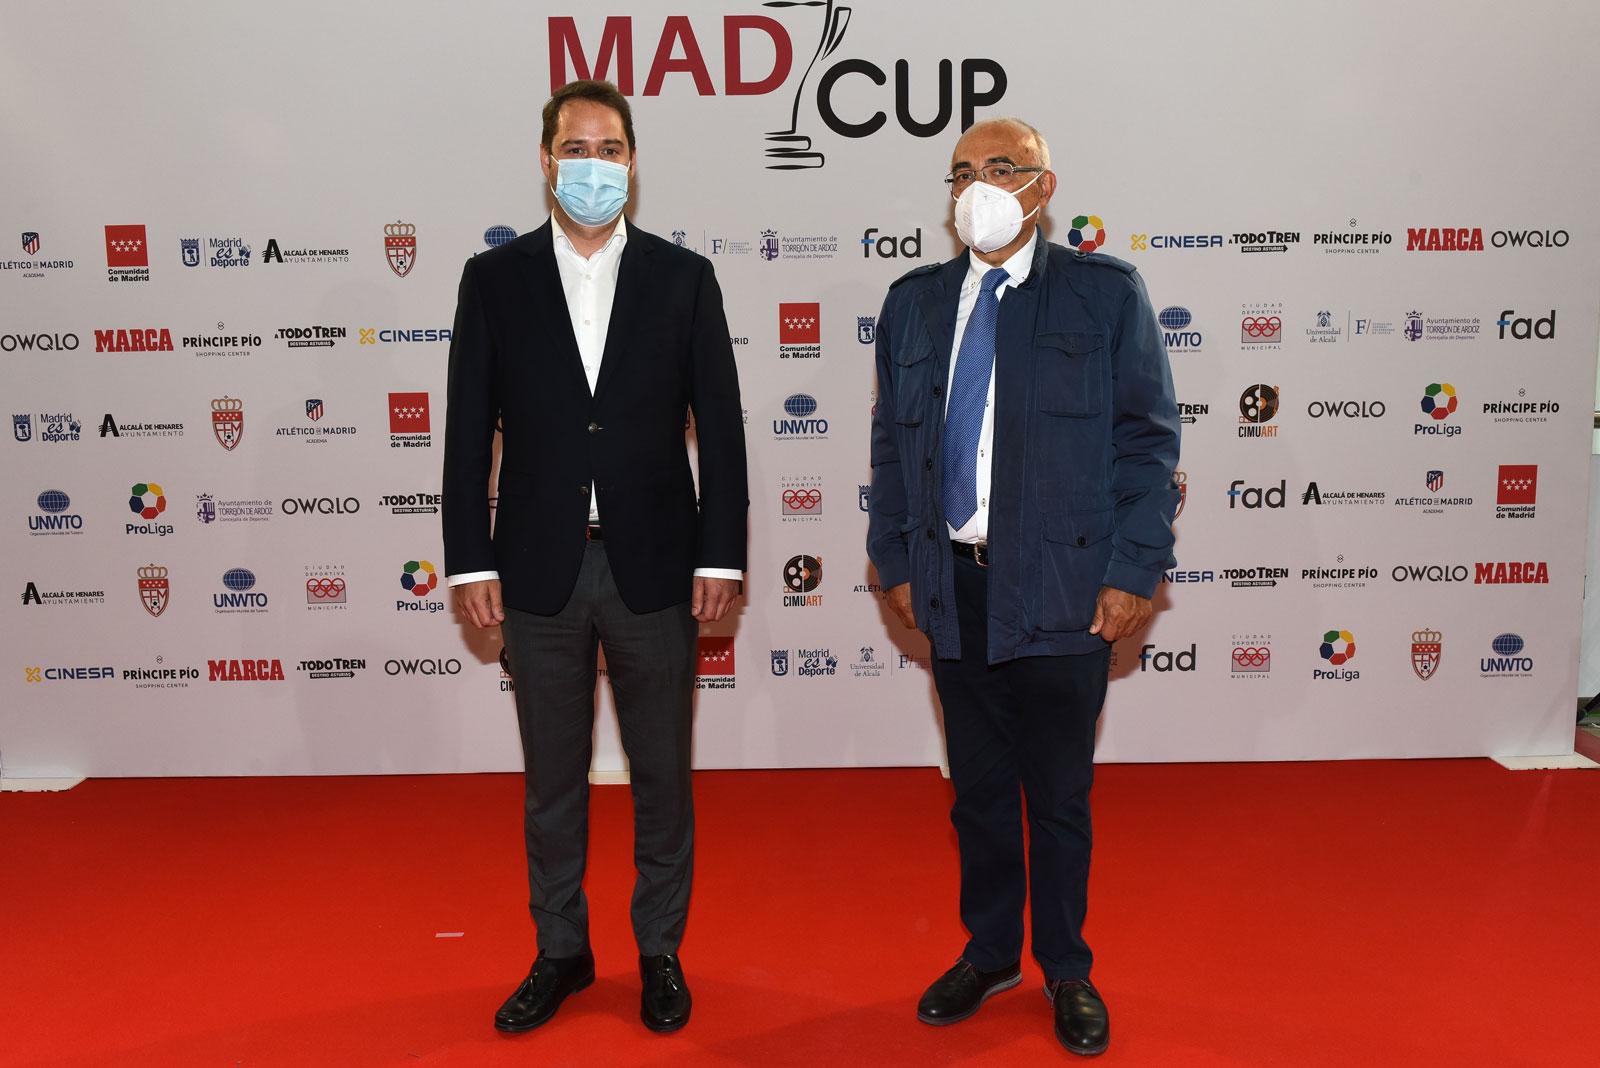 MadCup